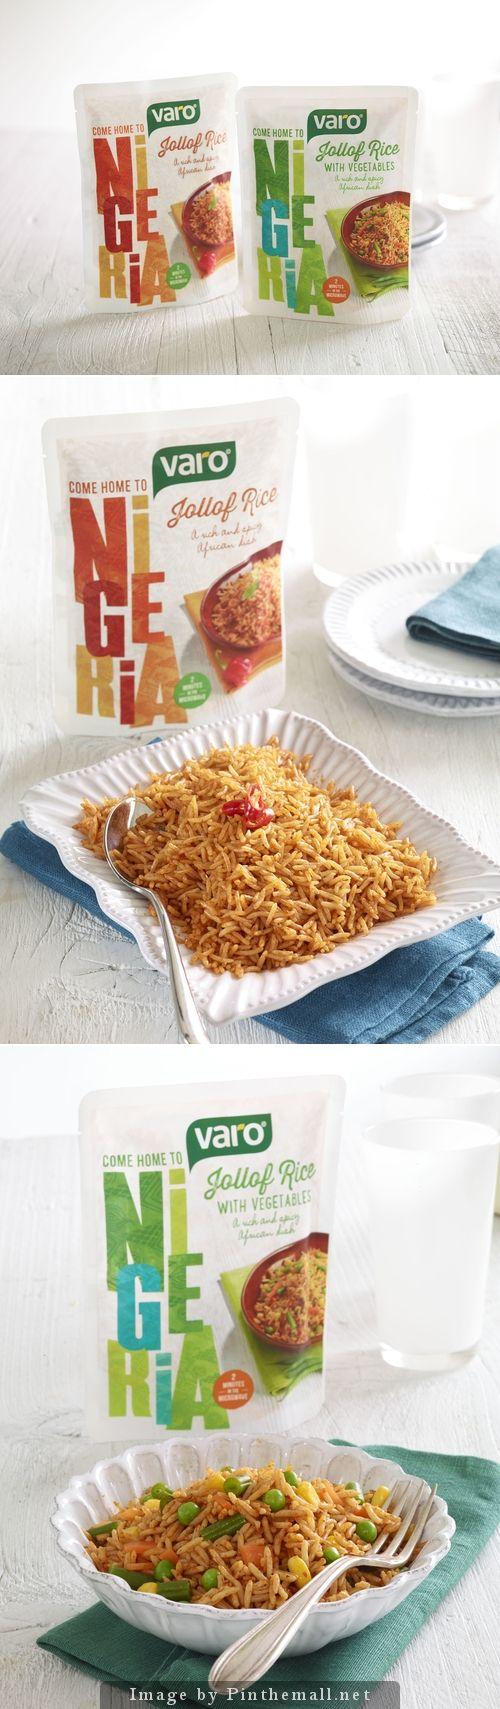 Varo: Jollof Rice | Designed by Family (and friends) | United Kingdom